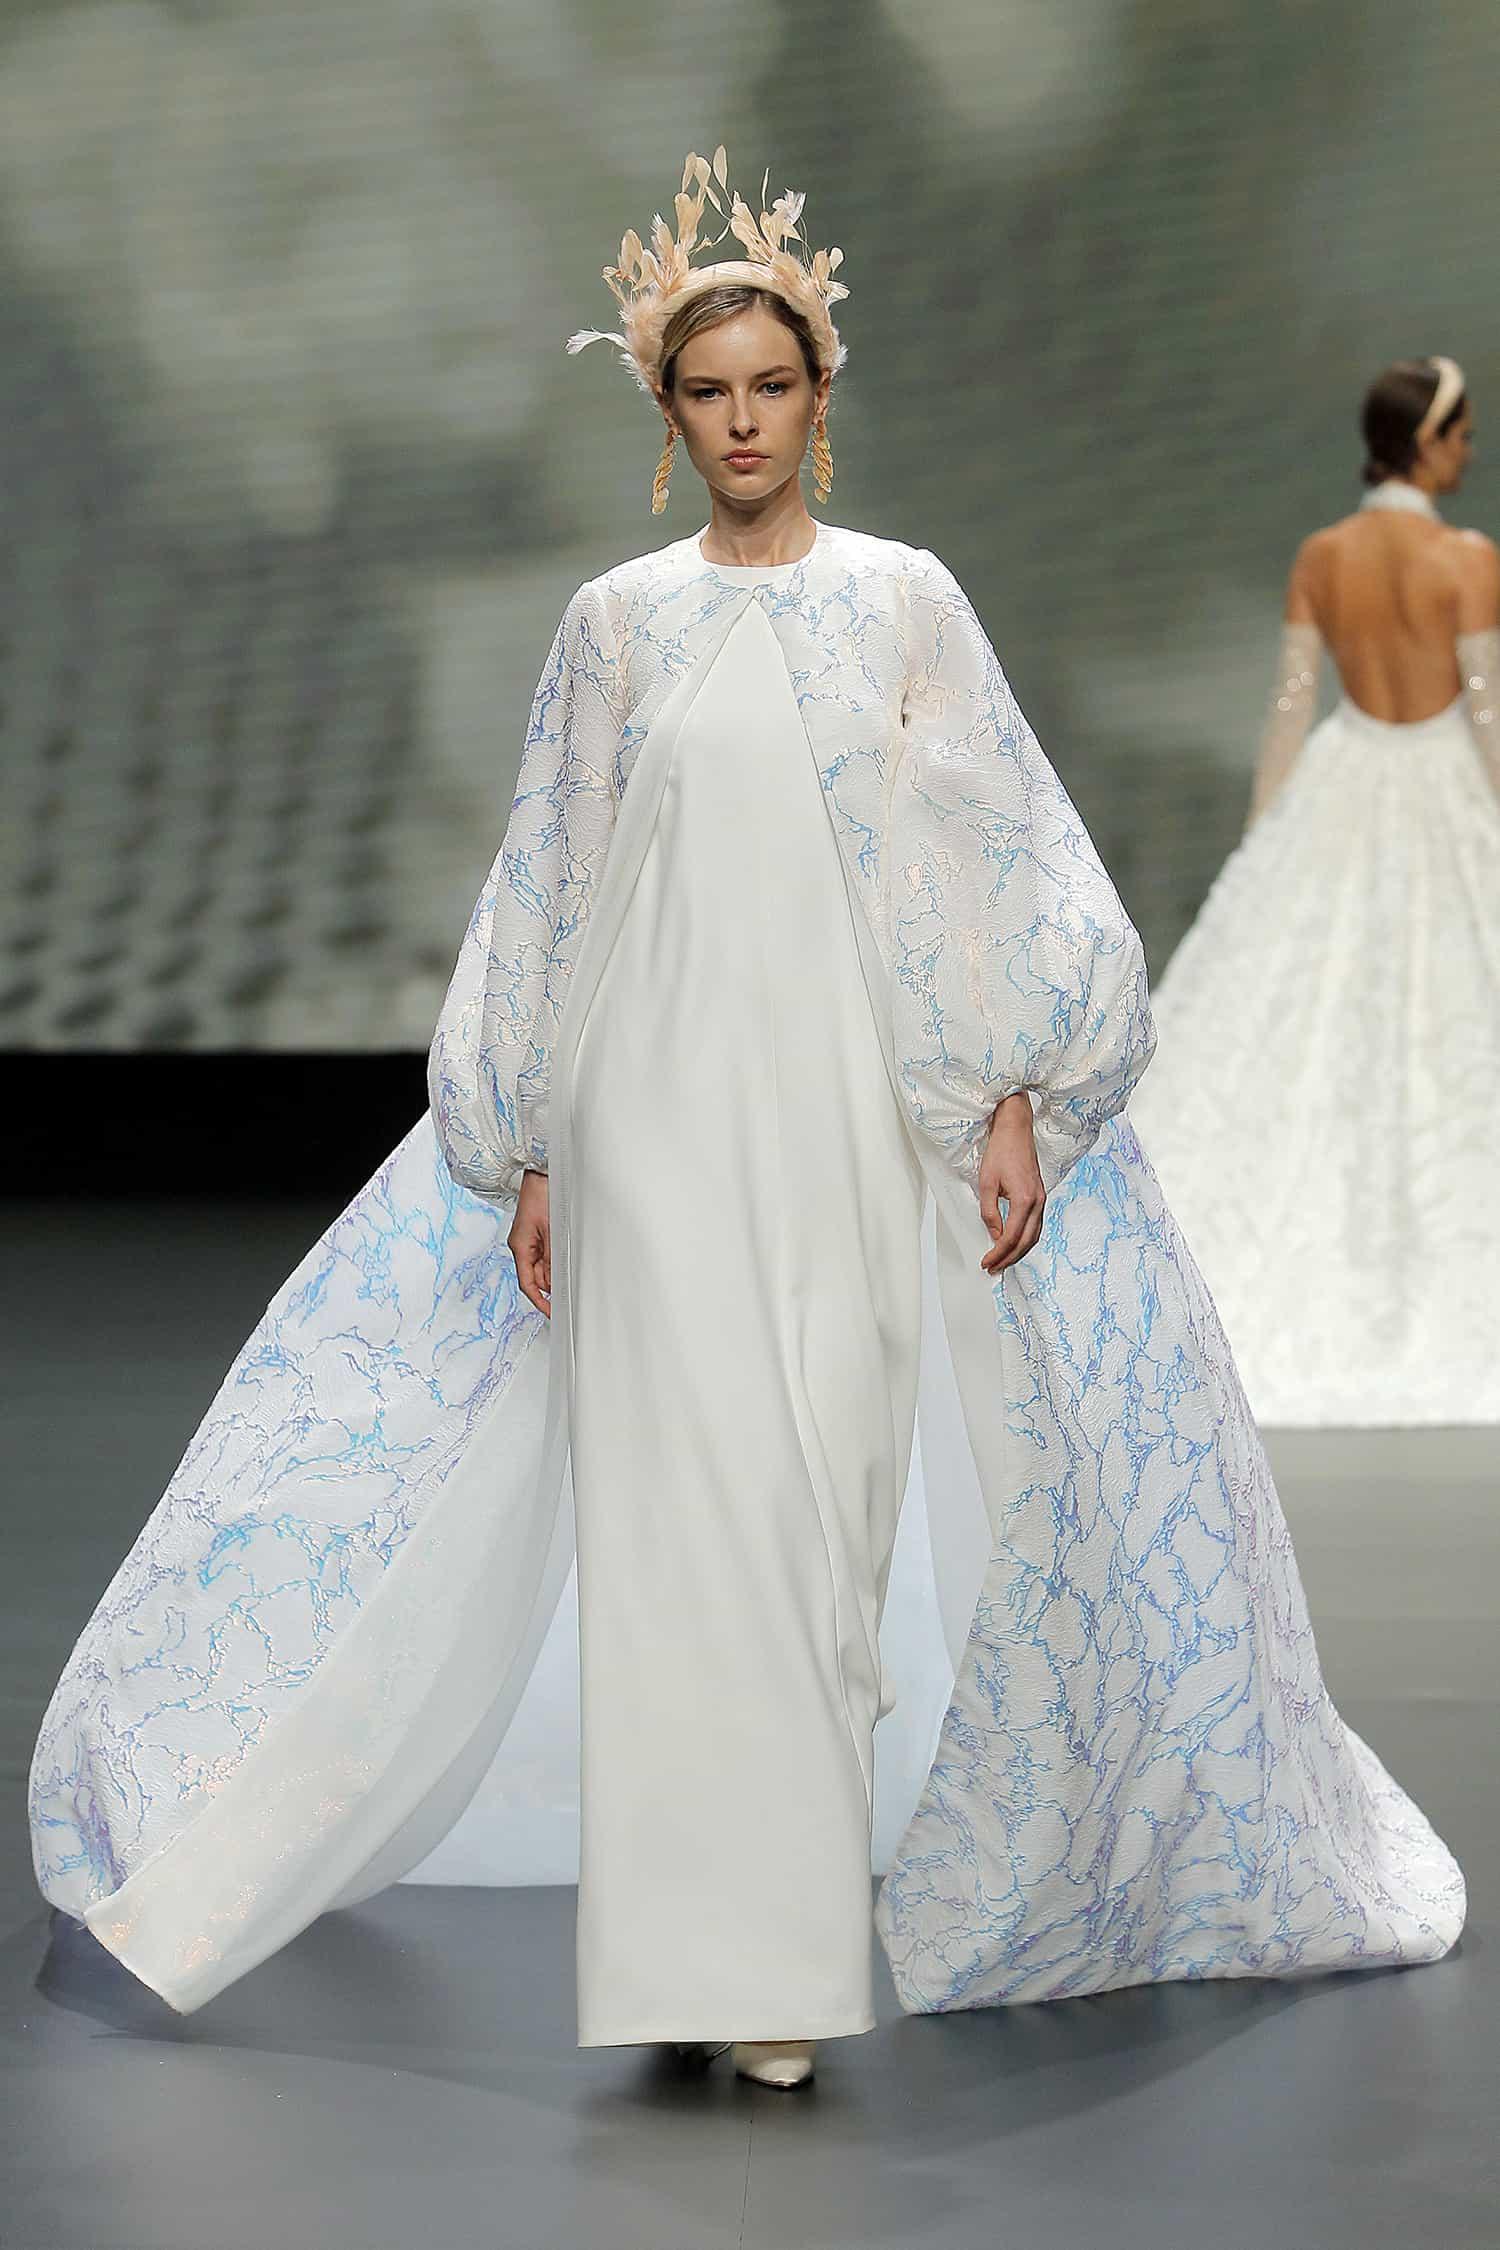 a wedding dress with cape by Jesus Peiro